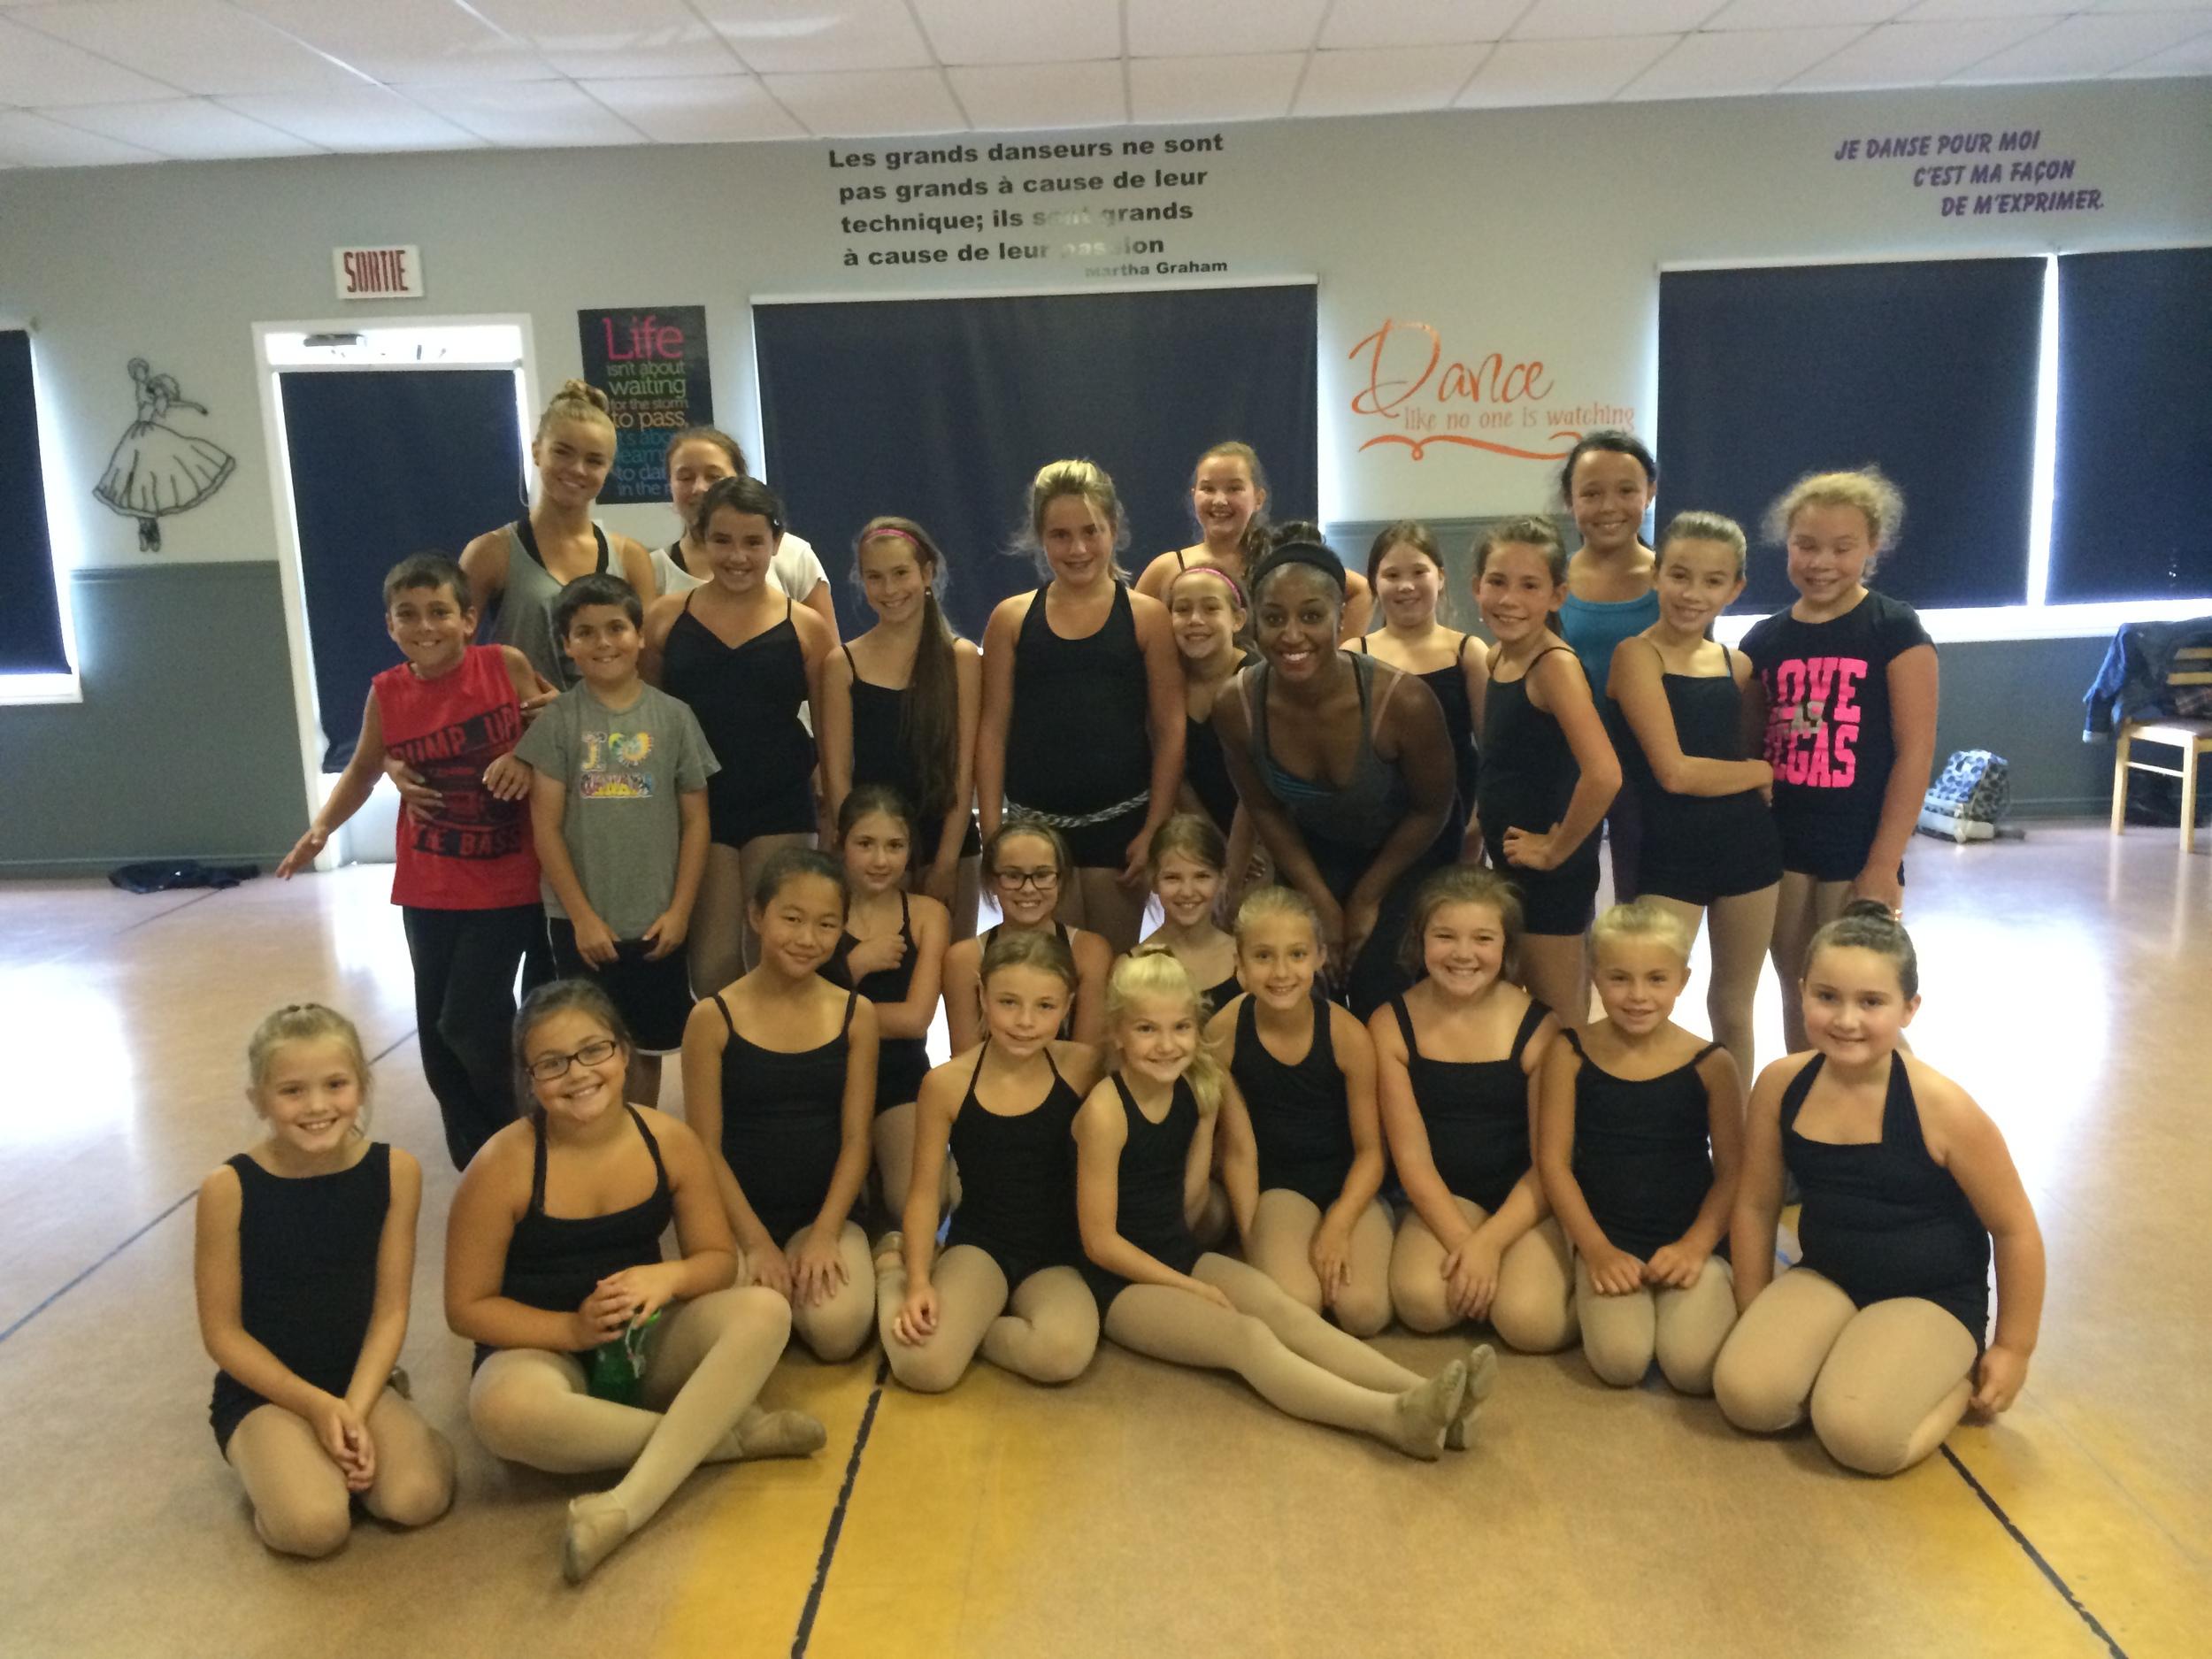 Danse Acadie 2014 Summer Dance Intensive- Jazz Dance Masterclasses with Saleemah E. Knight